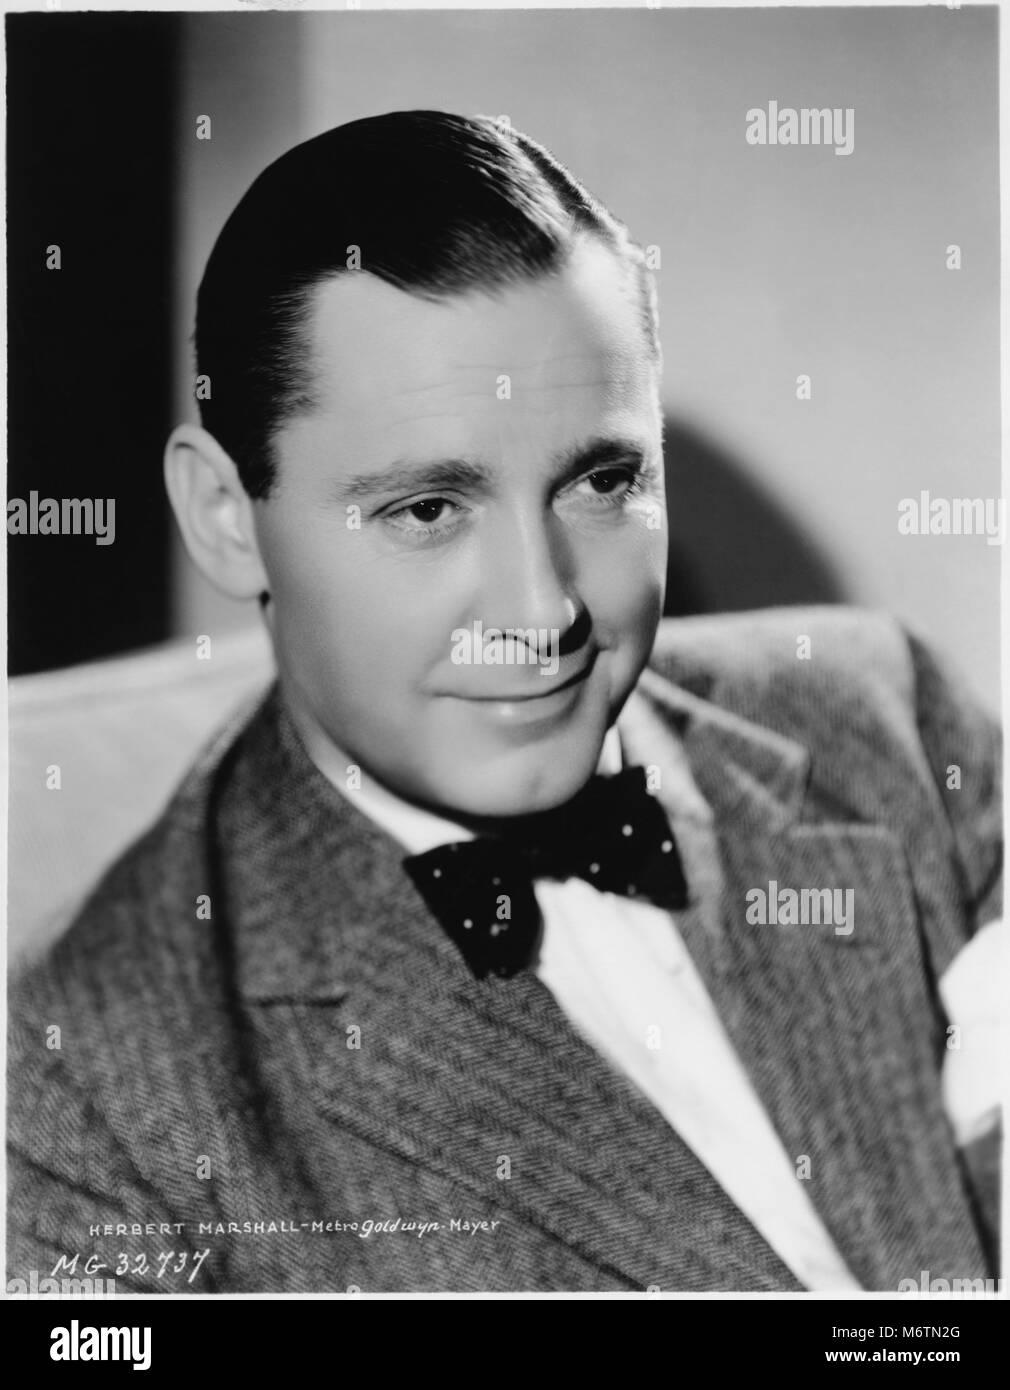 Herbert Marshall, Publicity Portrait, MGM, 1934 - Stock Image